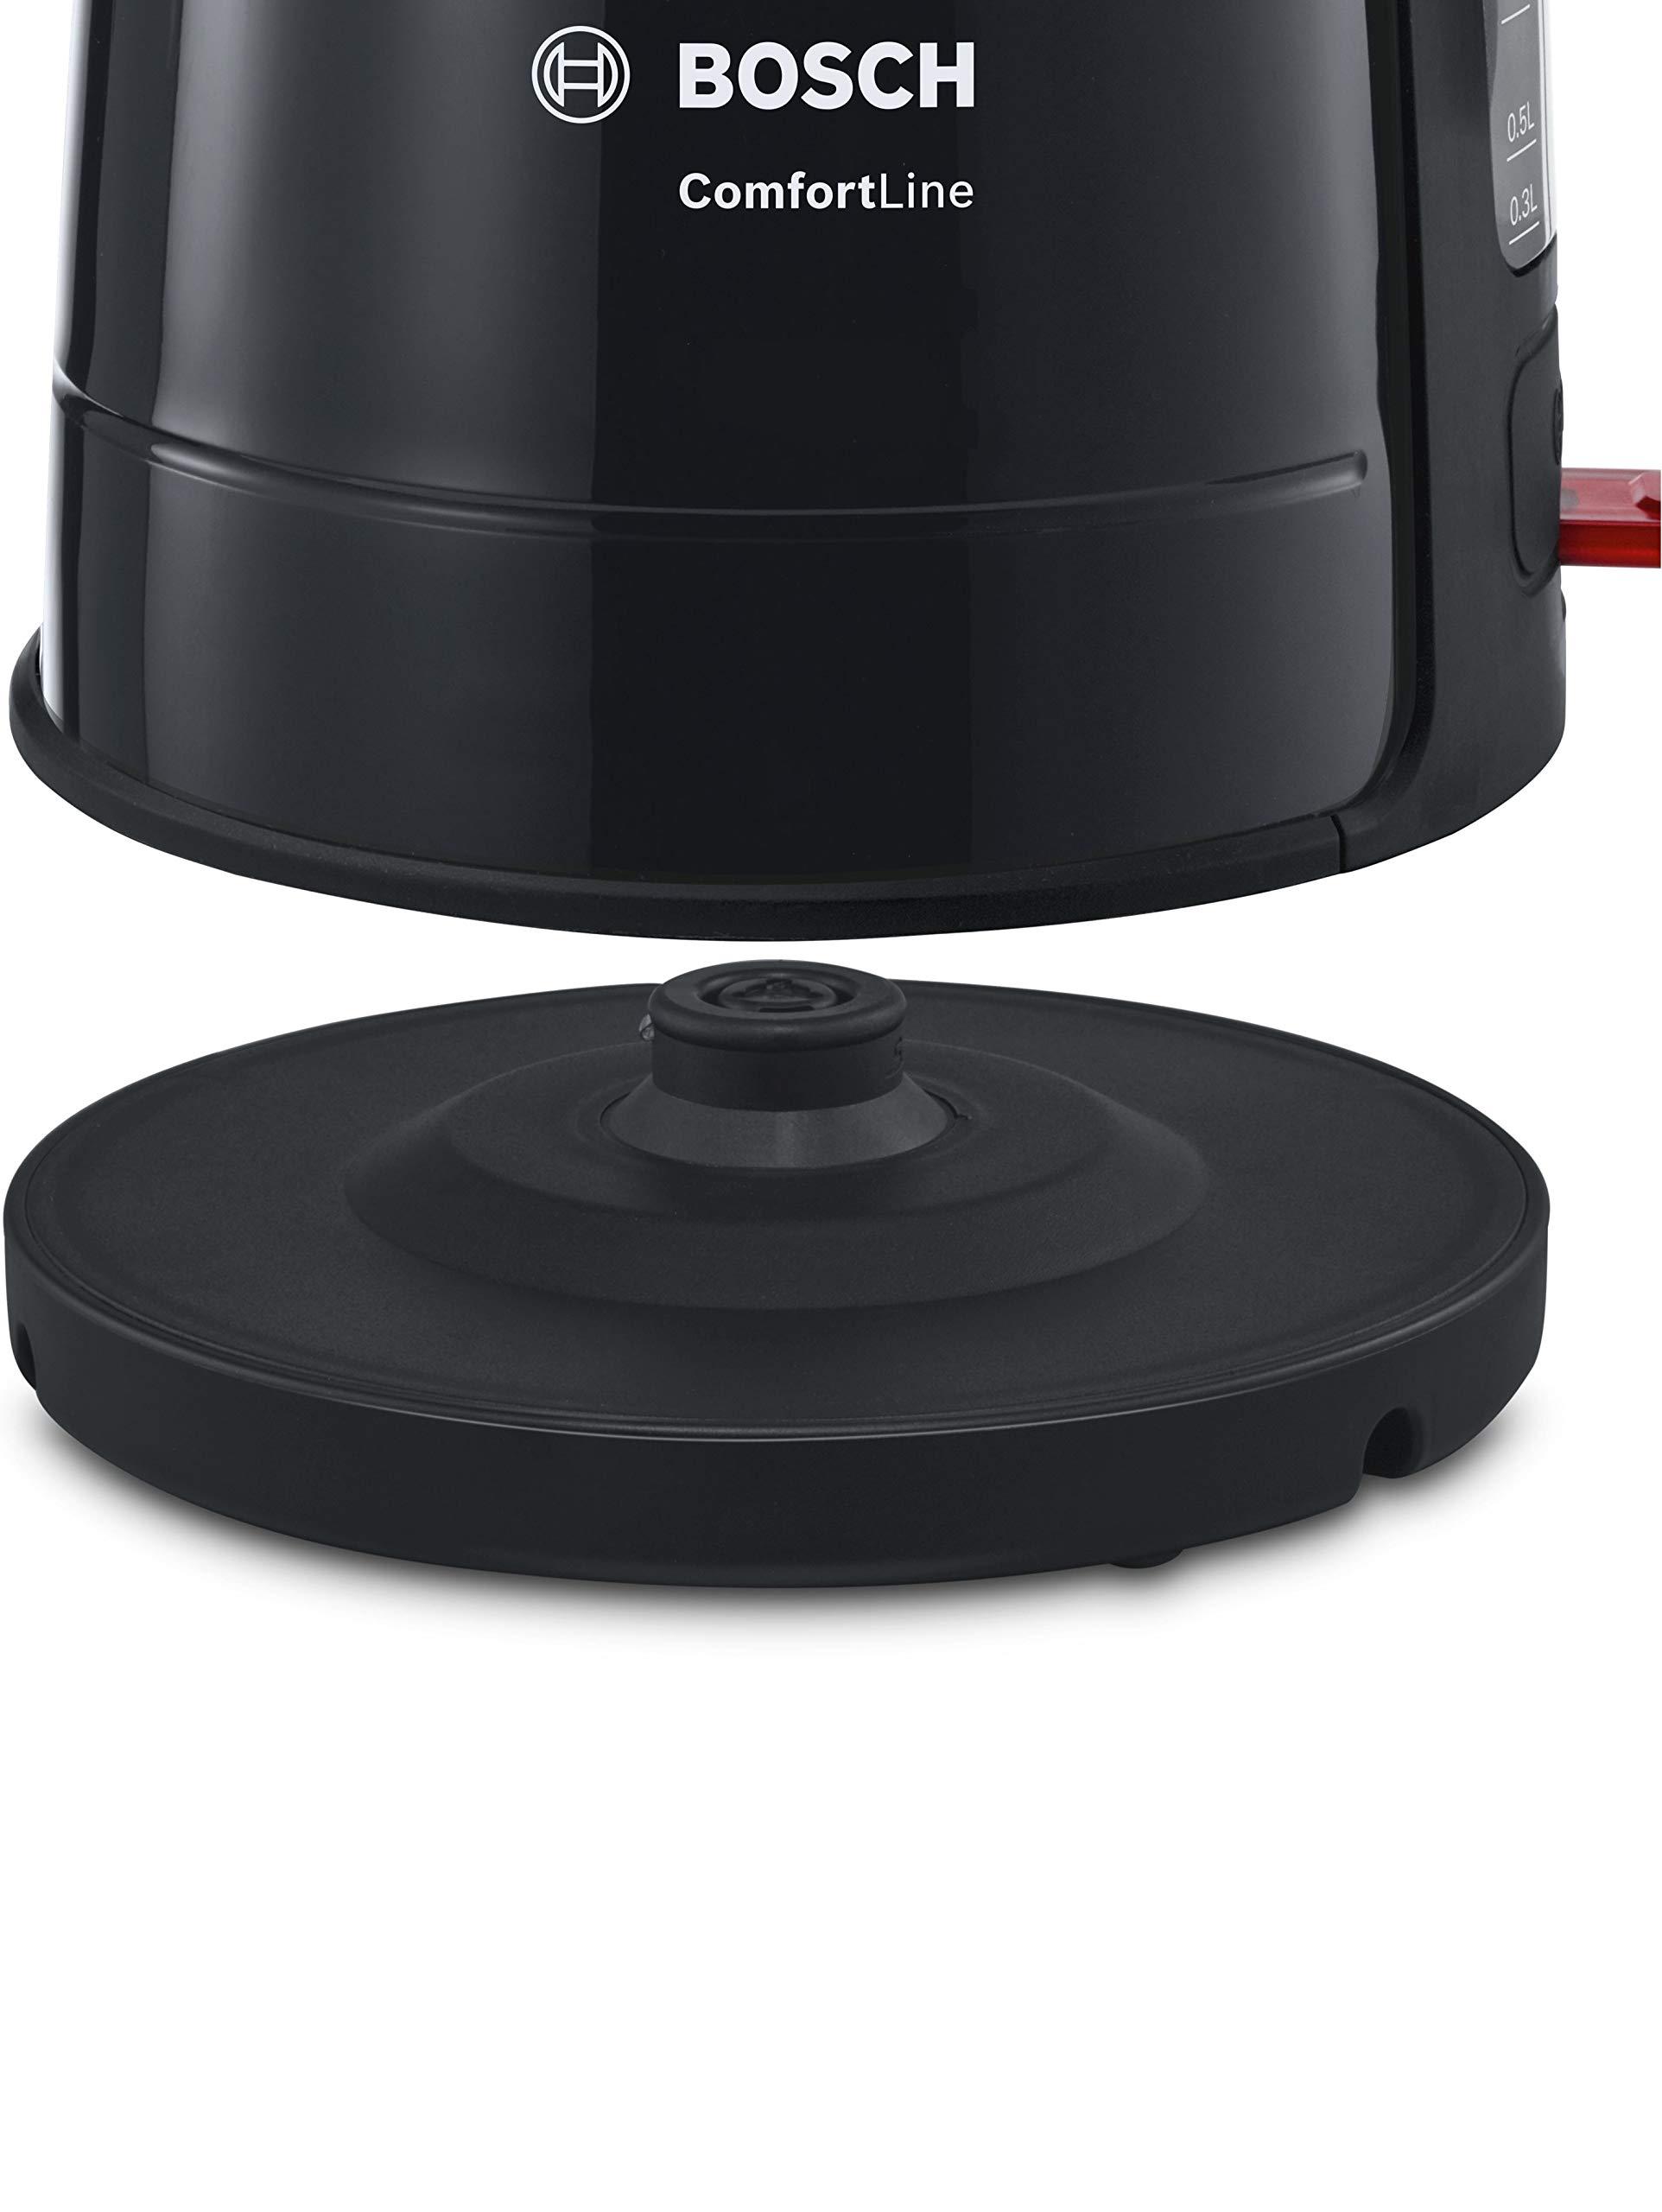 Bosch-Bosch-Wasserkocher-kabellos-ComfortLine